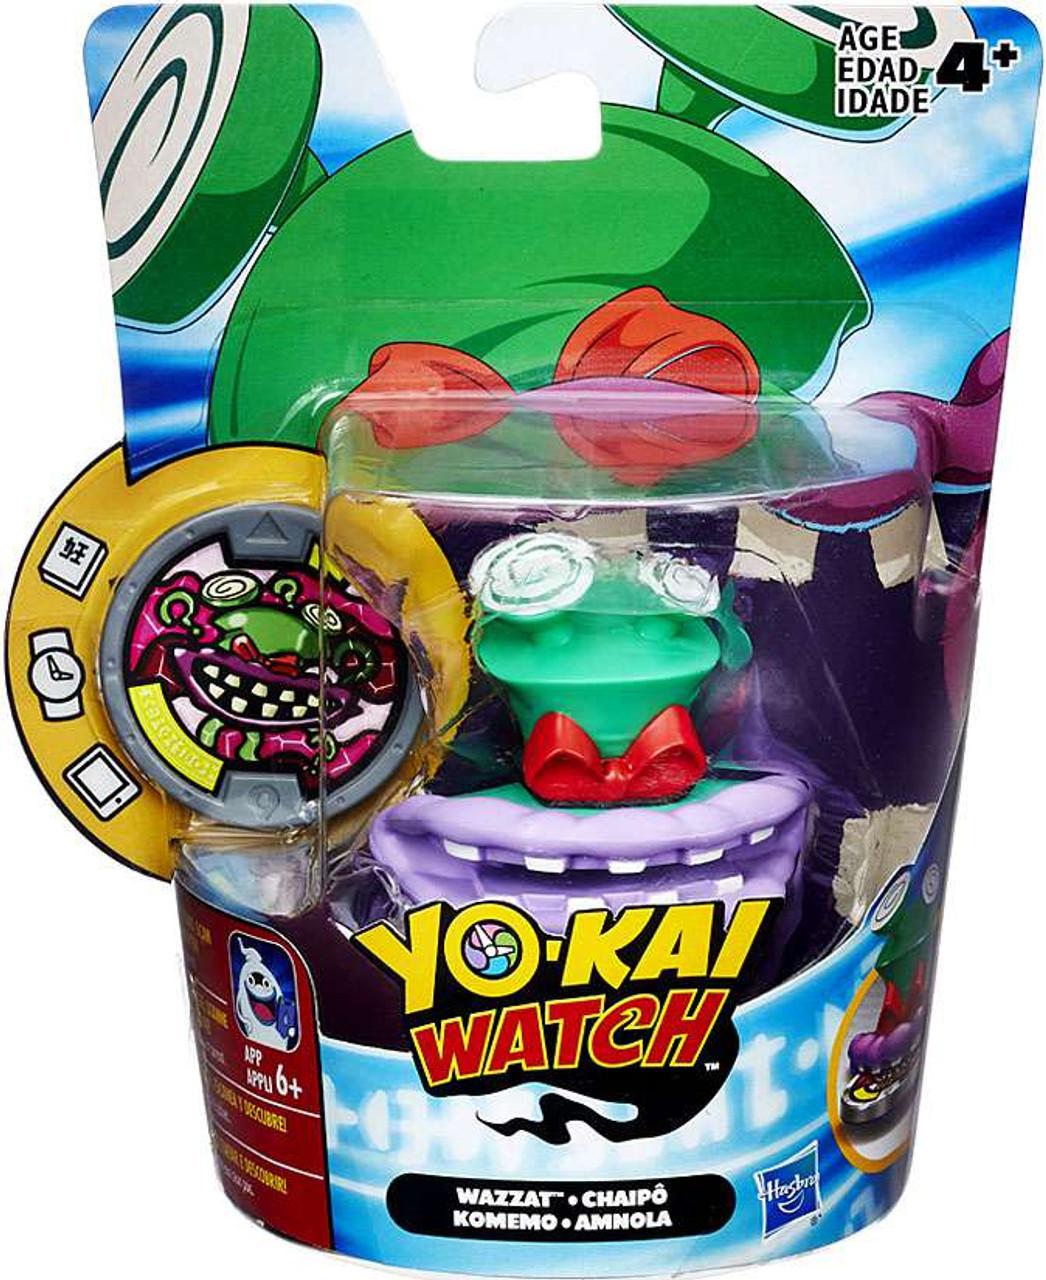 yo kai watch medal moments wazzat mini figure hasbro toys toywiz. Black Bedroom Furniture Sets. Home Design Ideas